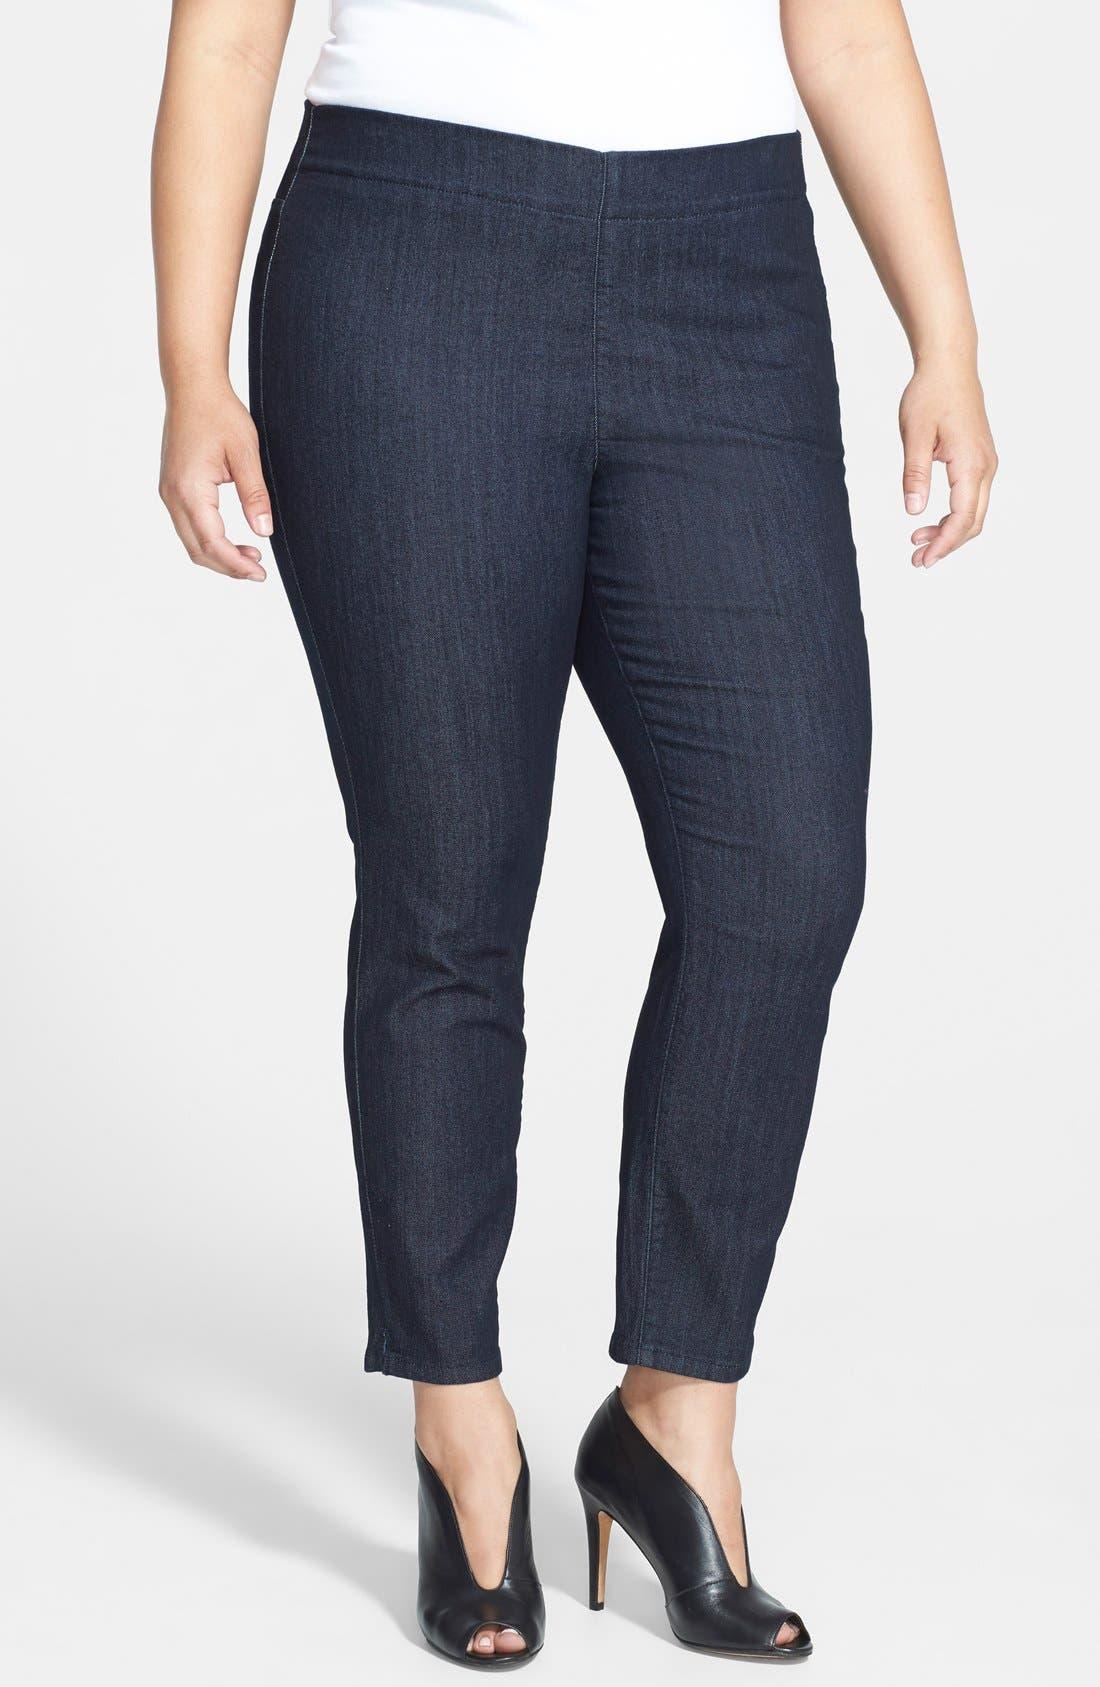 Main Image - NYDJ 'Millie' Stretch Ankle Jeans (Dark Enzyme) (Plus Size)